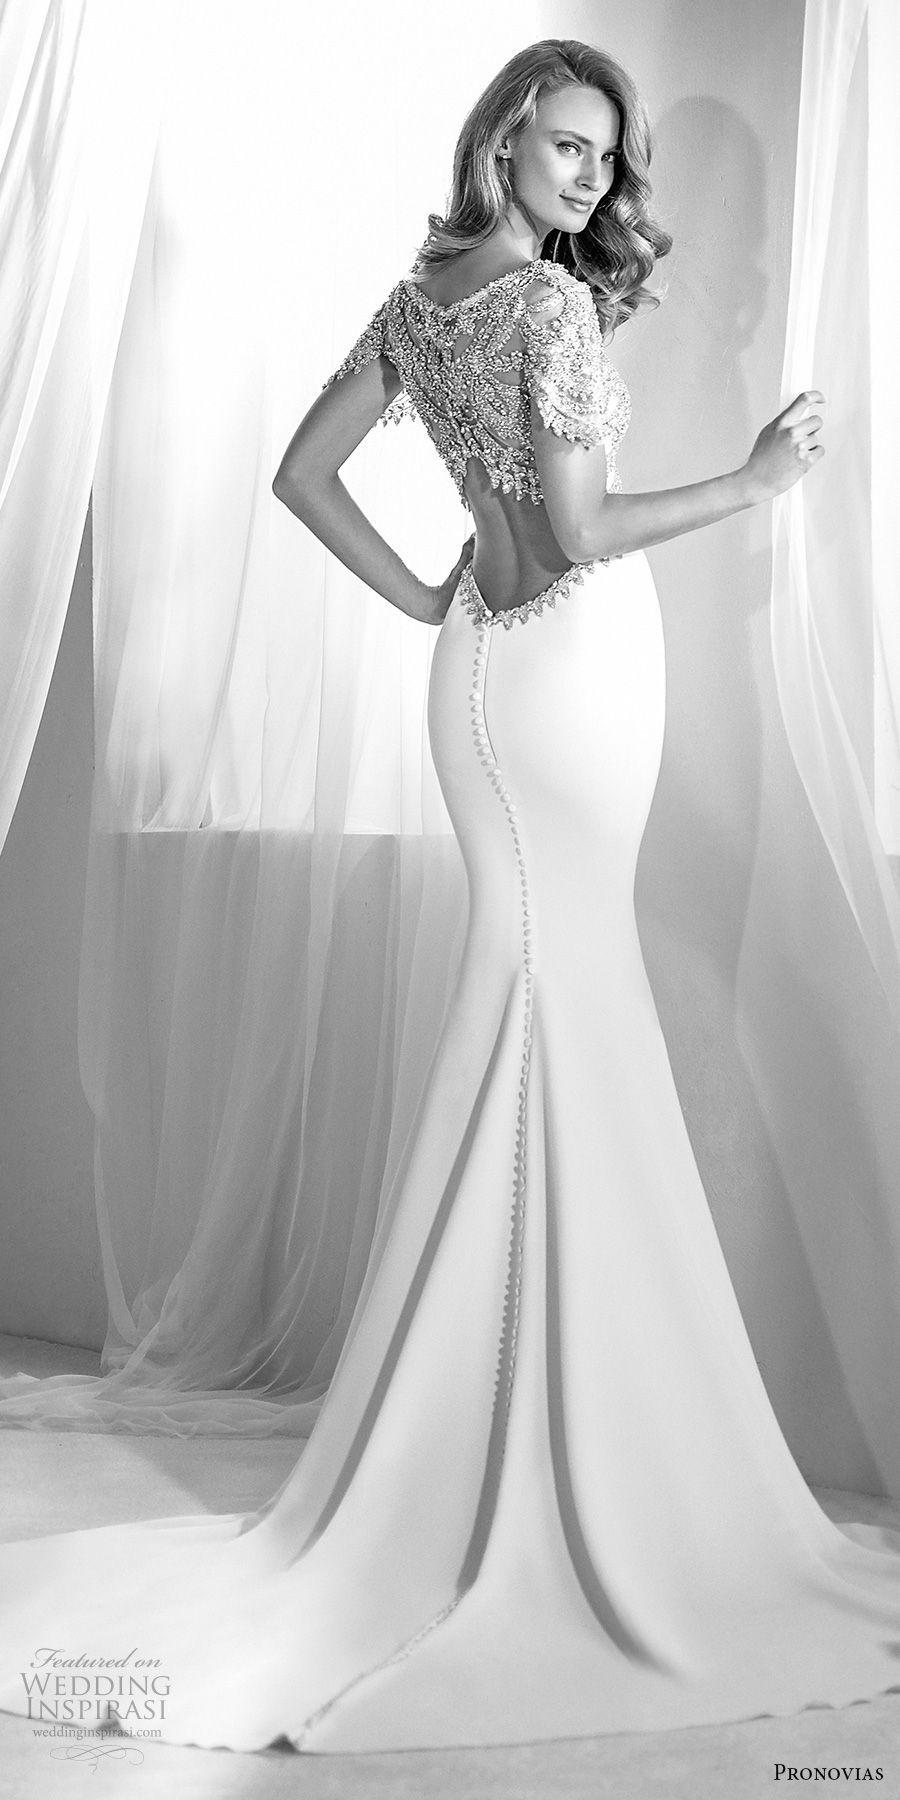 Atelier pronovias wedding dresses atelier pronovias wedding